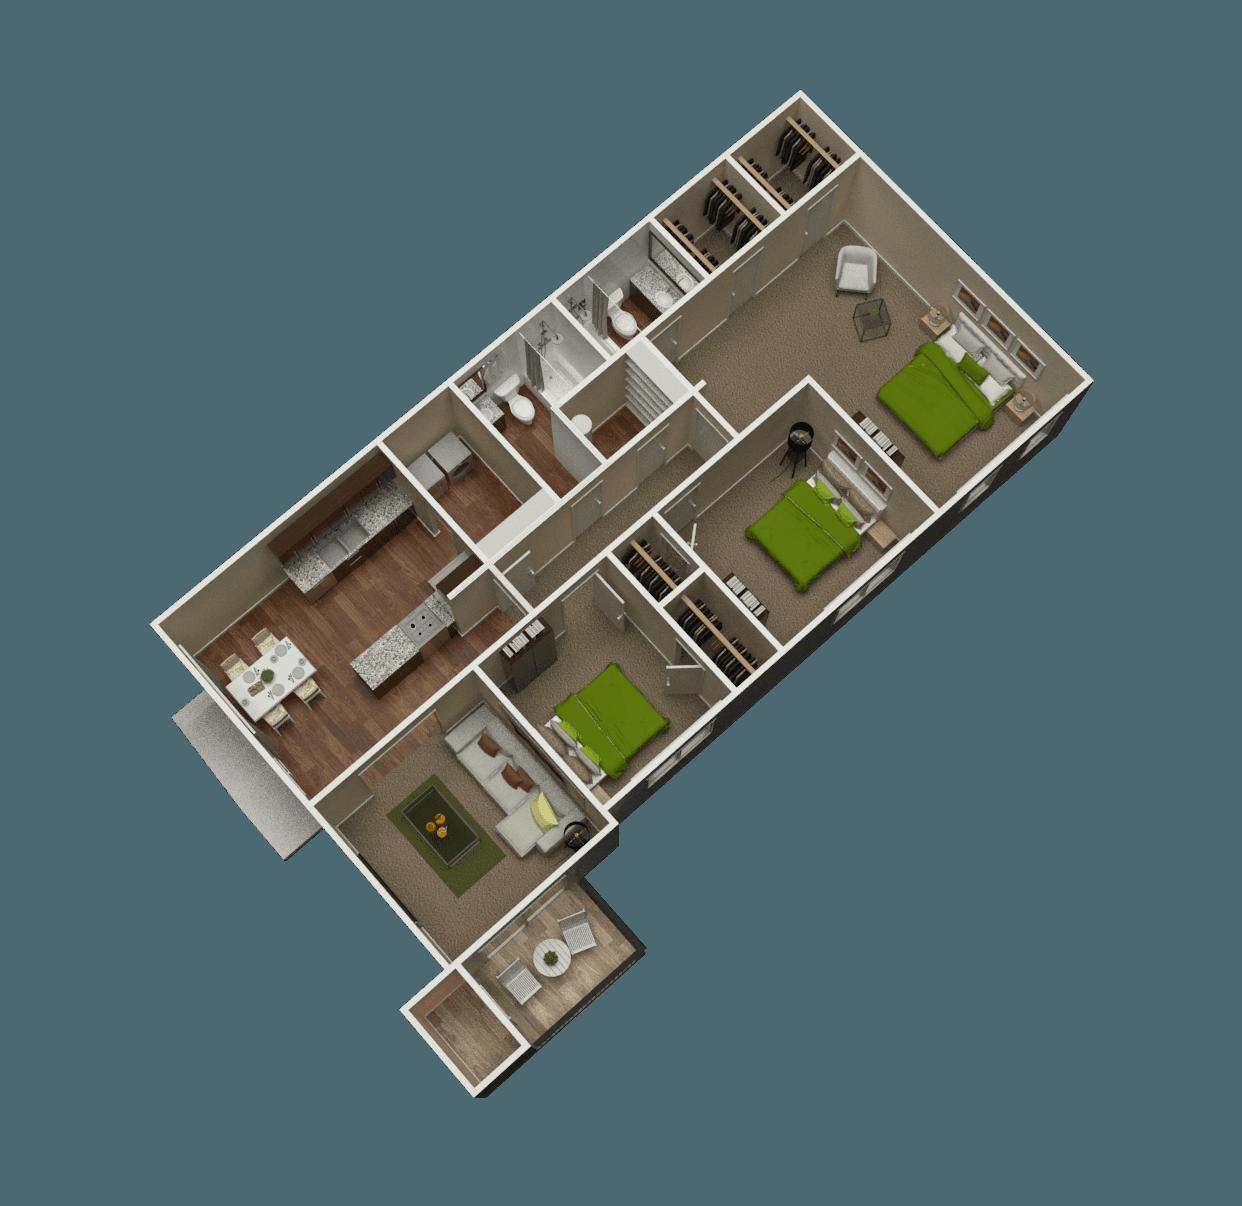 Hoover Apartments Birmingham Al: Branchwater Apartments Birmingham, AL